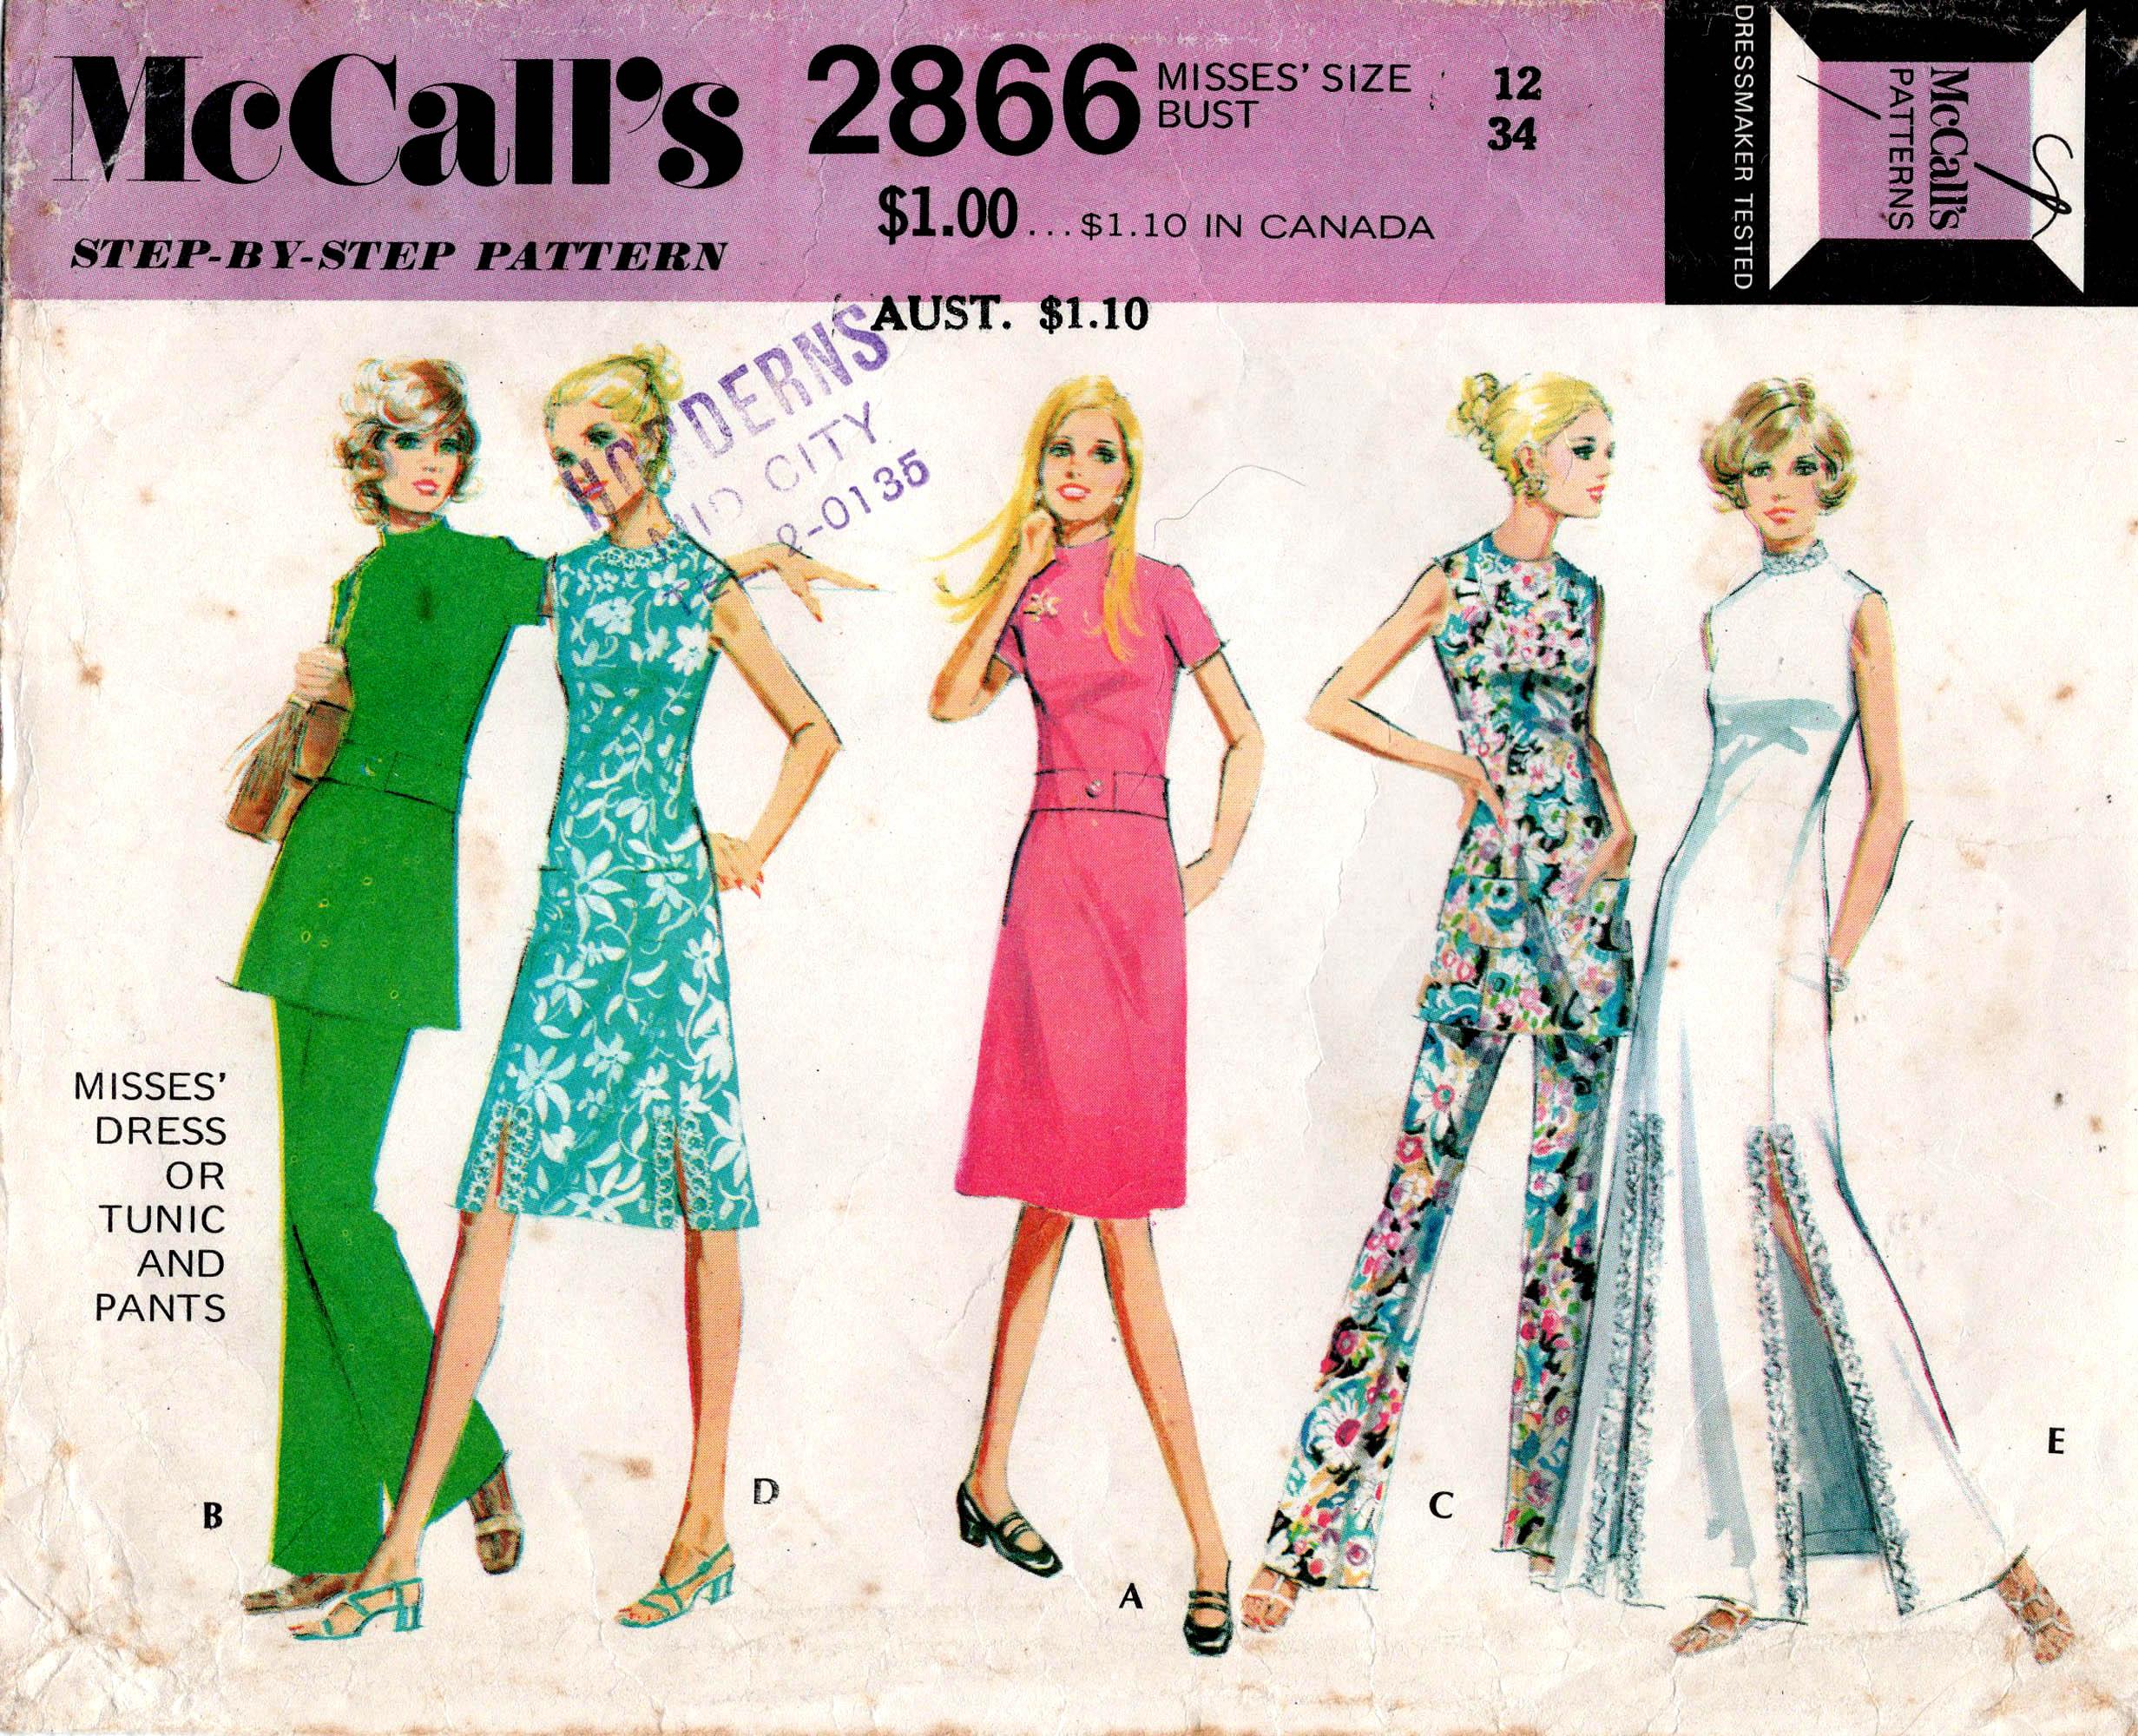 McCall's 2866